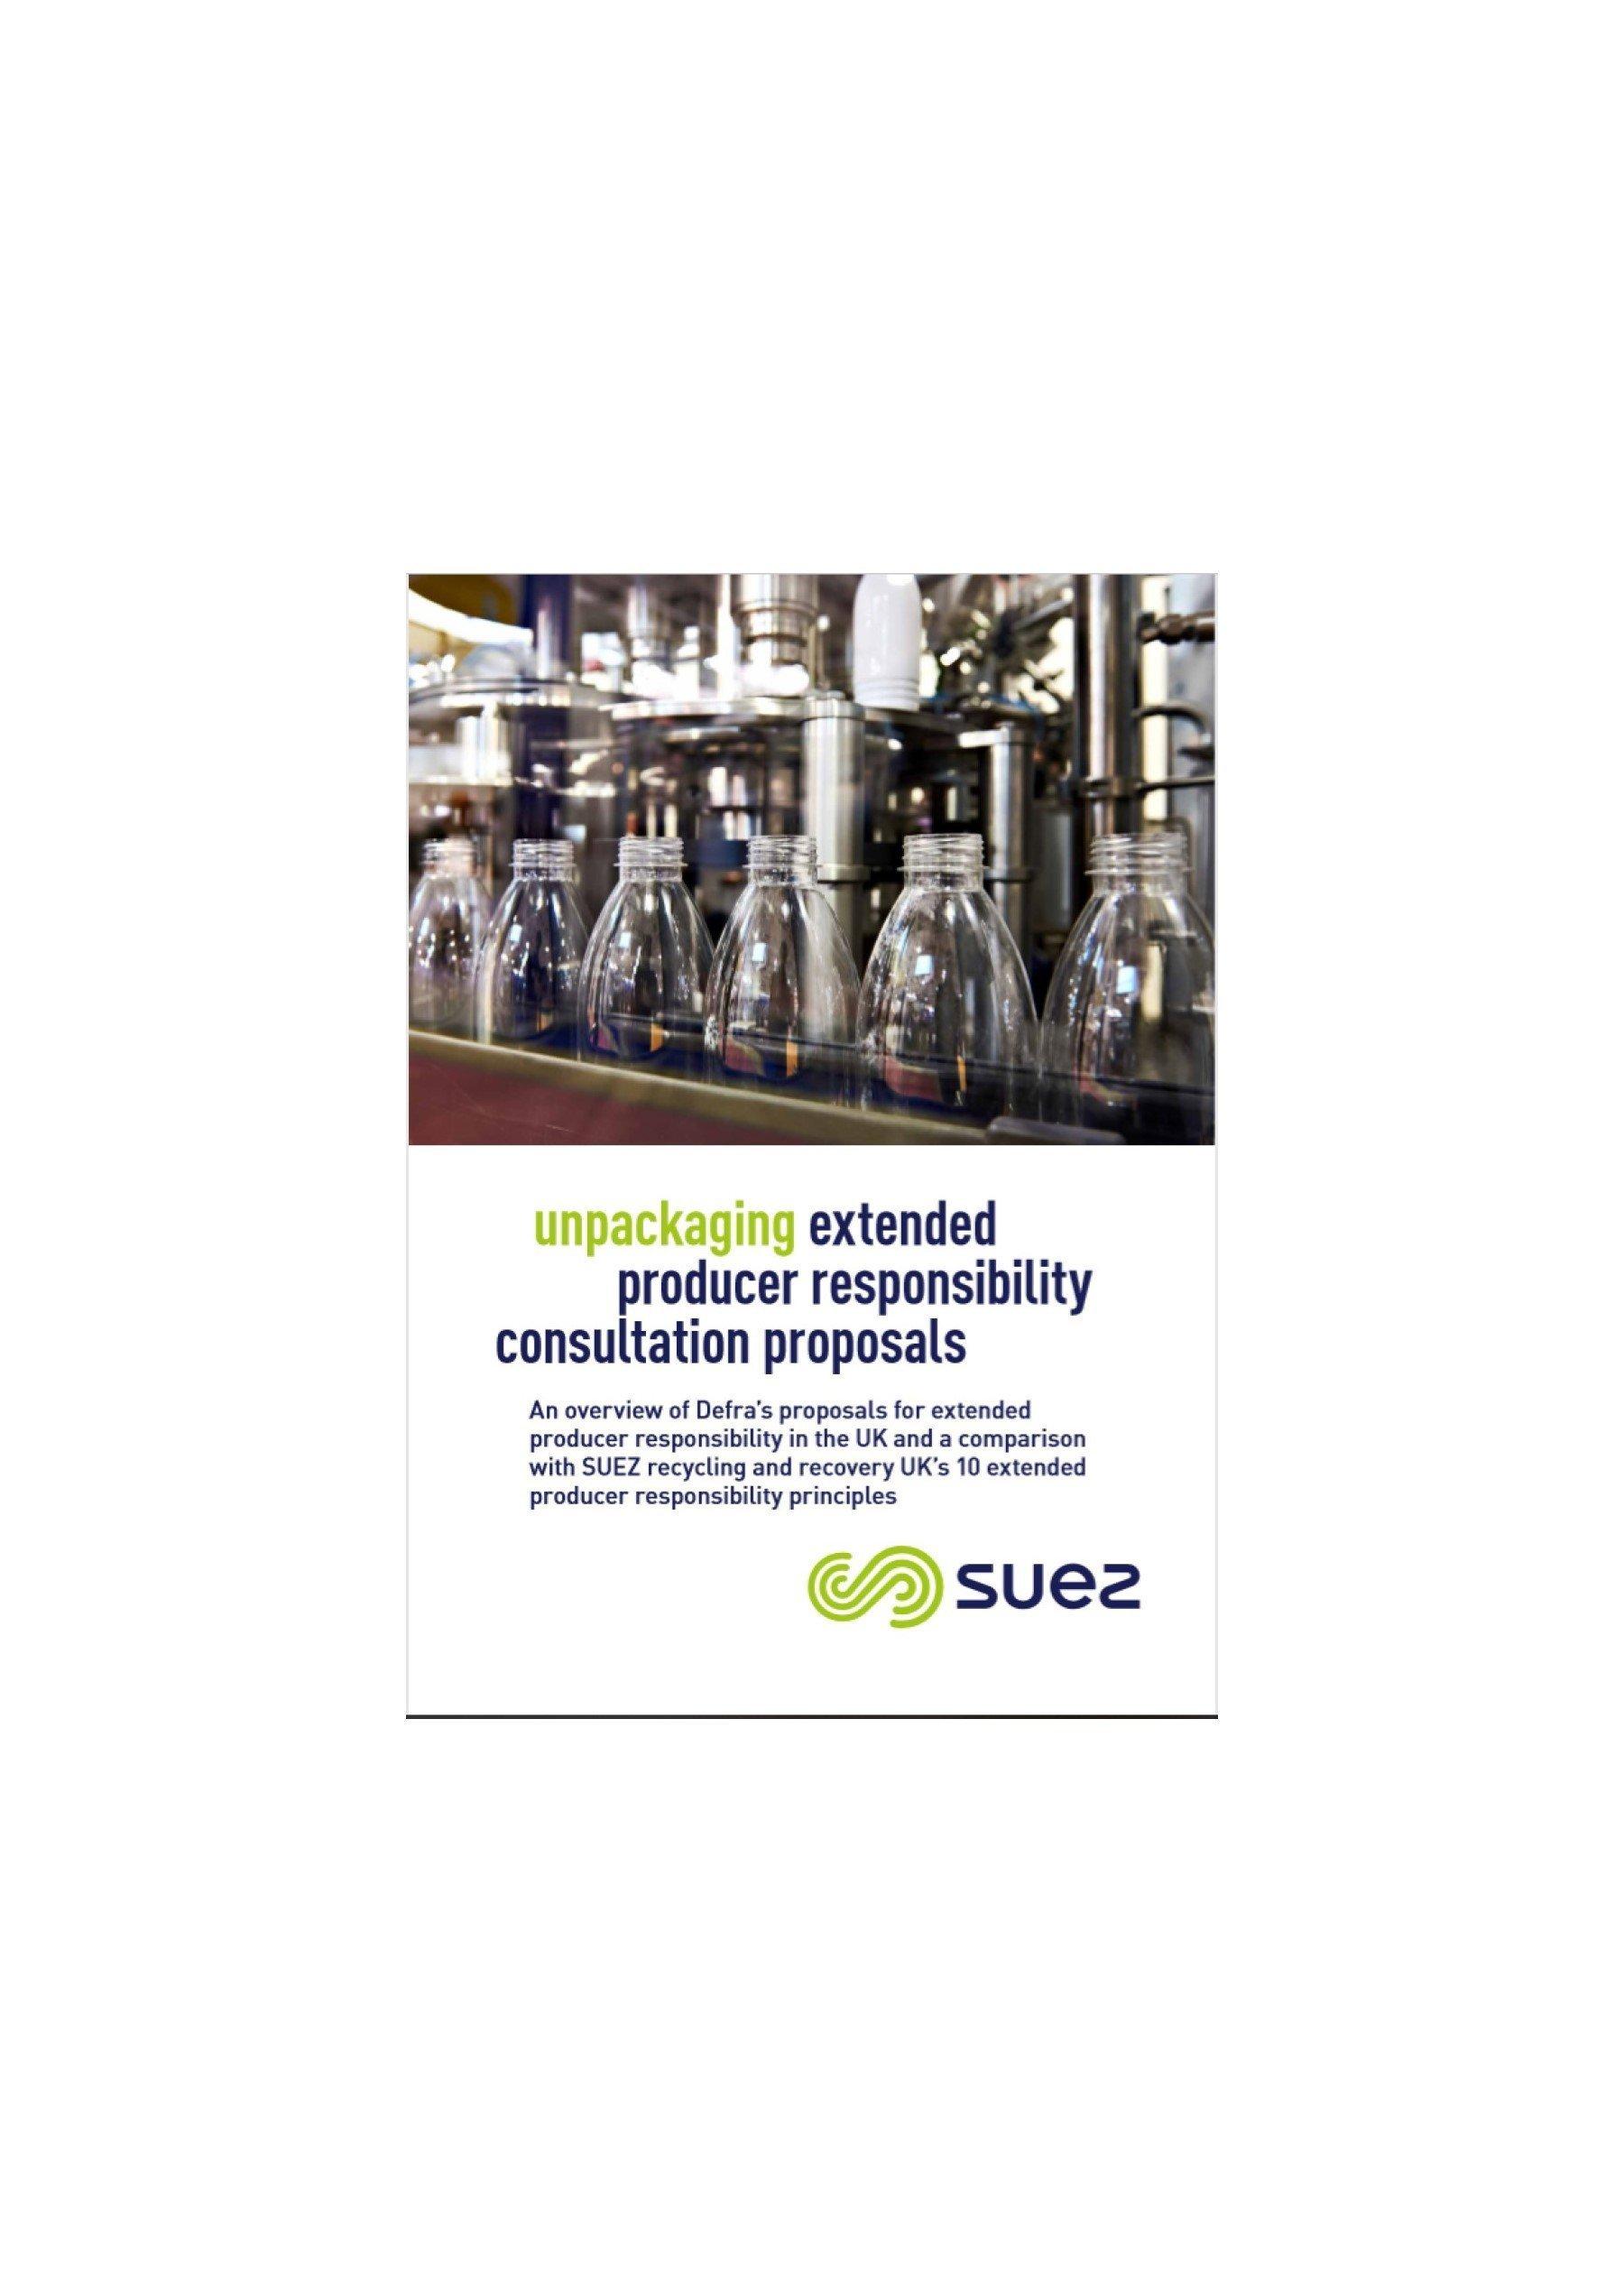 SUEZ publishes review of Defra producer-responsibility proposals